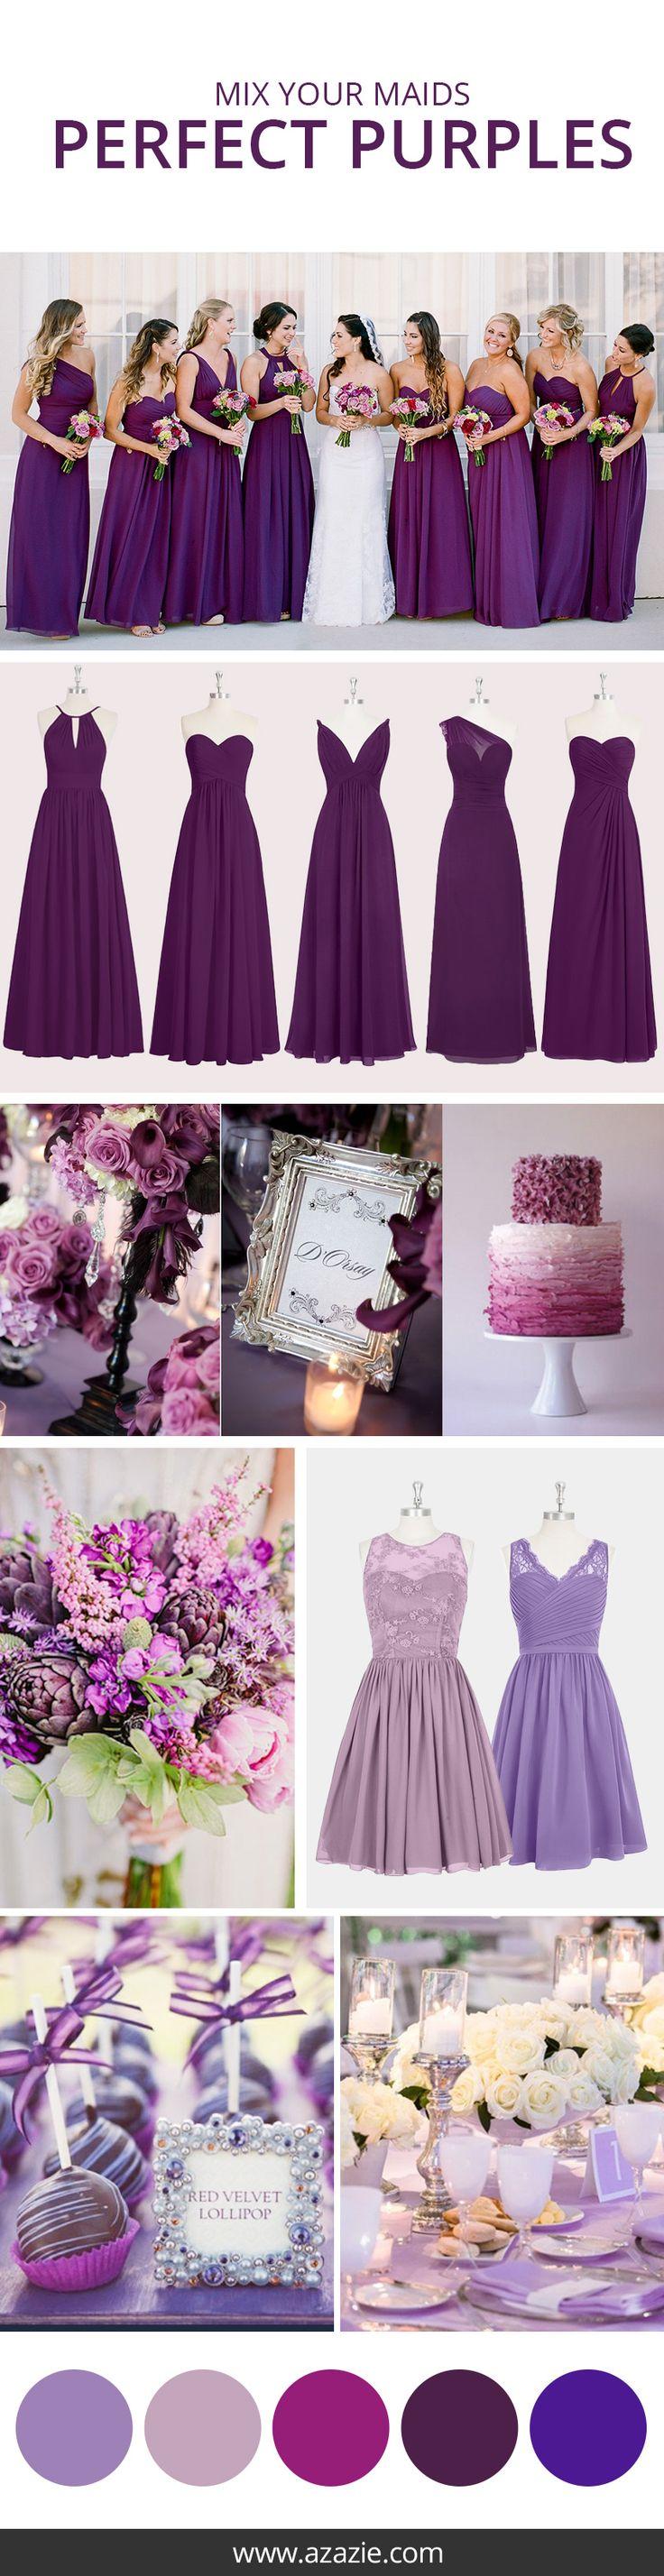 www.viajeslunamiel.com ♥ | #Ideas #Viajes #LunaMiel #Love #Amor #Boda #Wedding #NosCasamos #CelebraElAmor #Juntos #Novia #damasDeHonor #maidOfHonor #Purple #Morado #Vestido